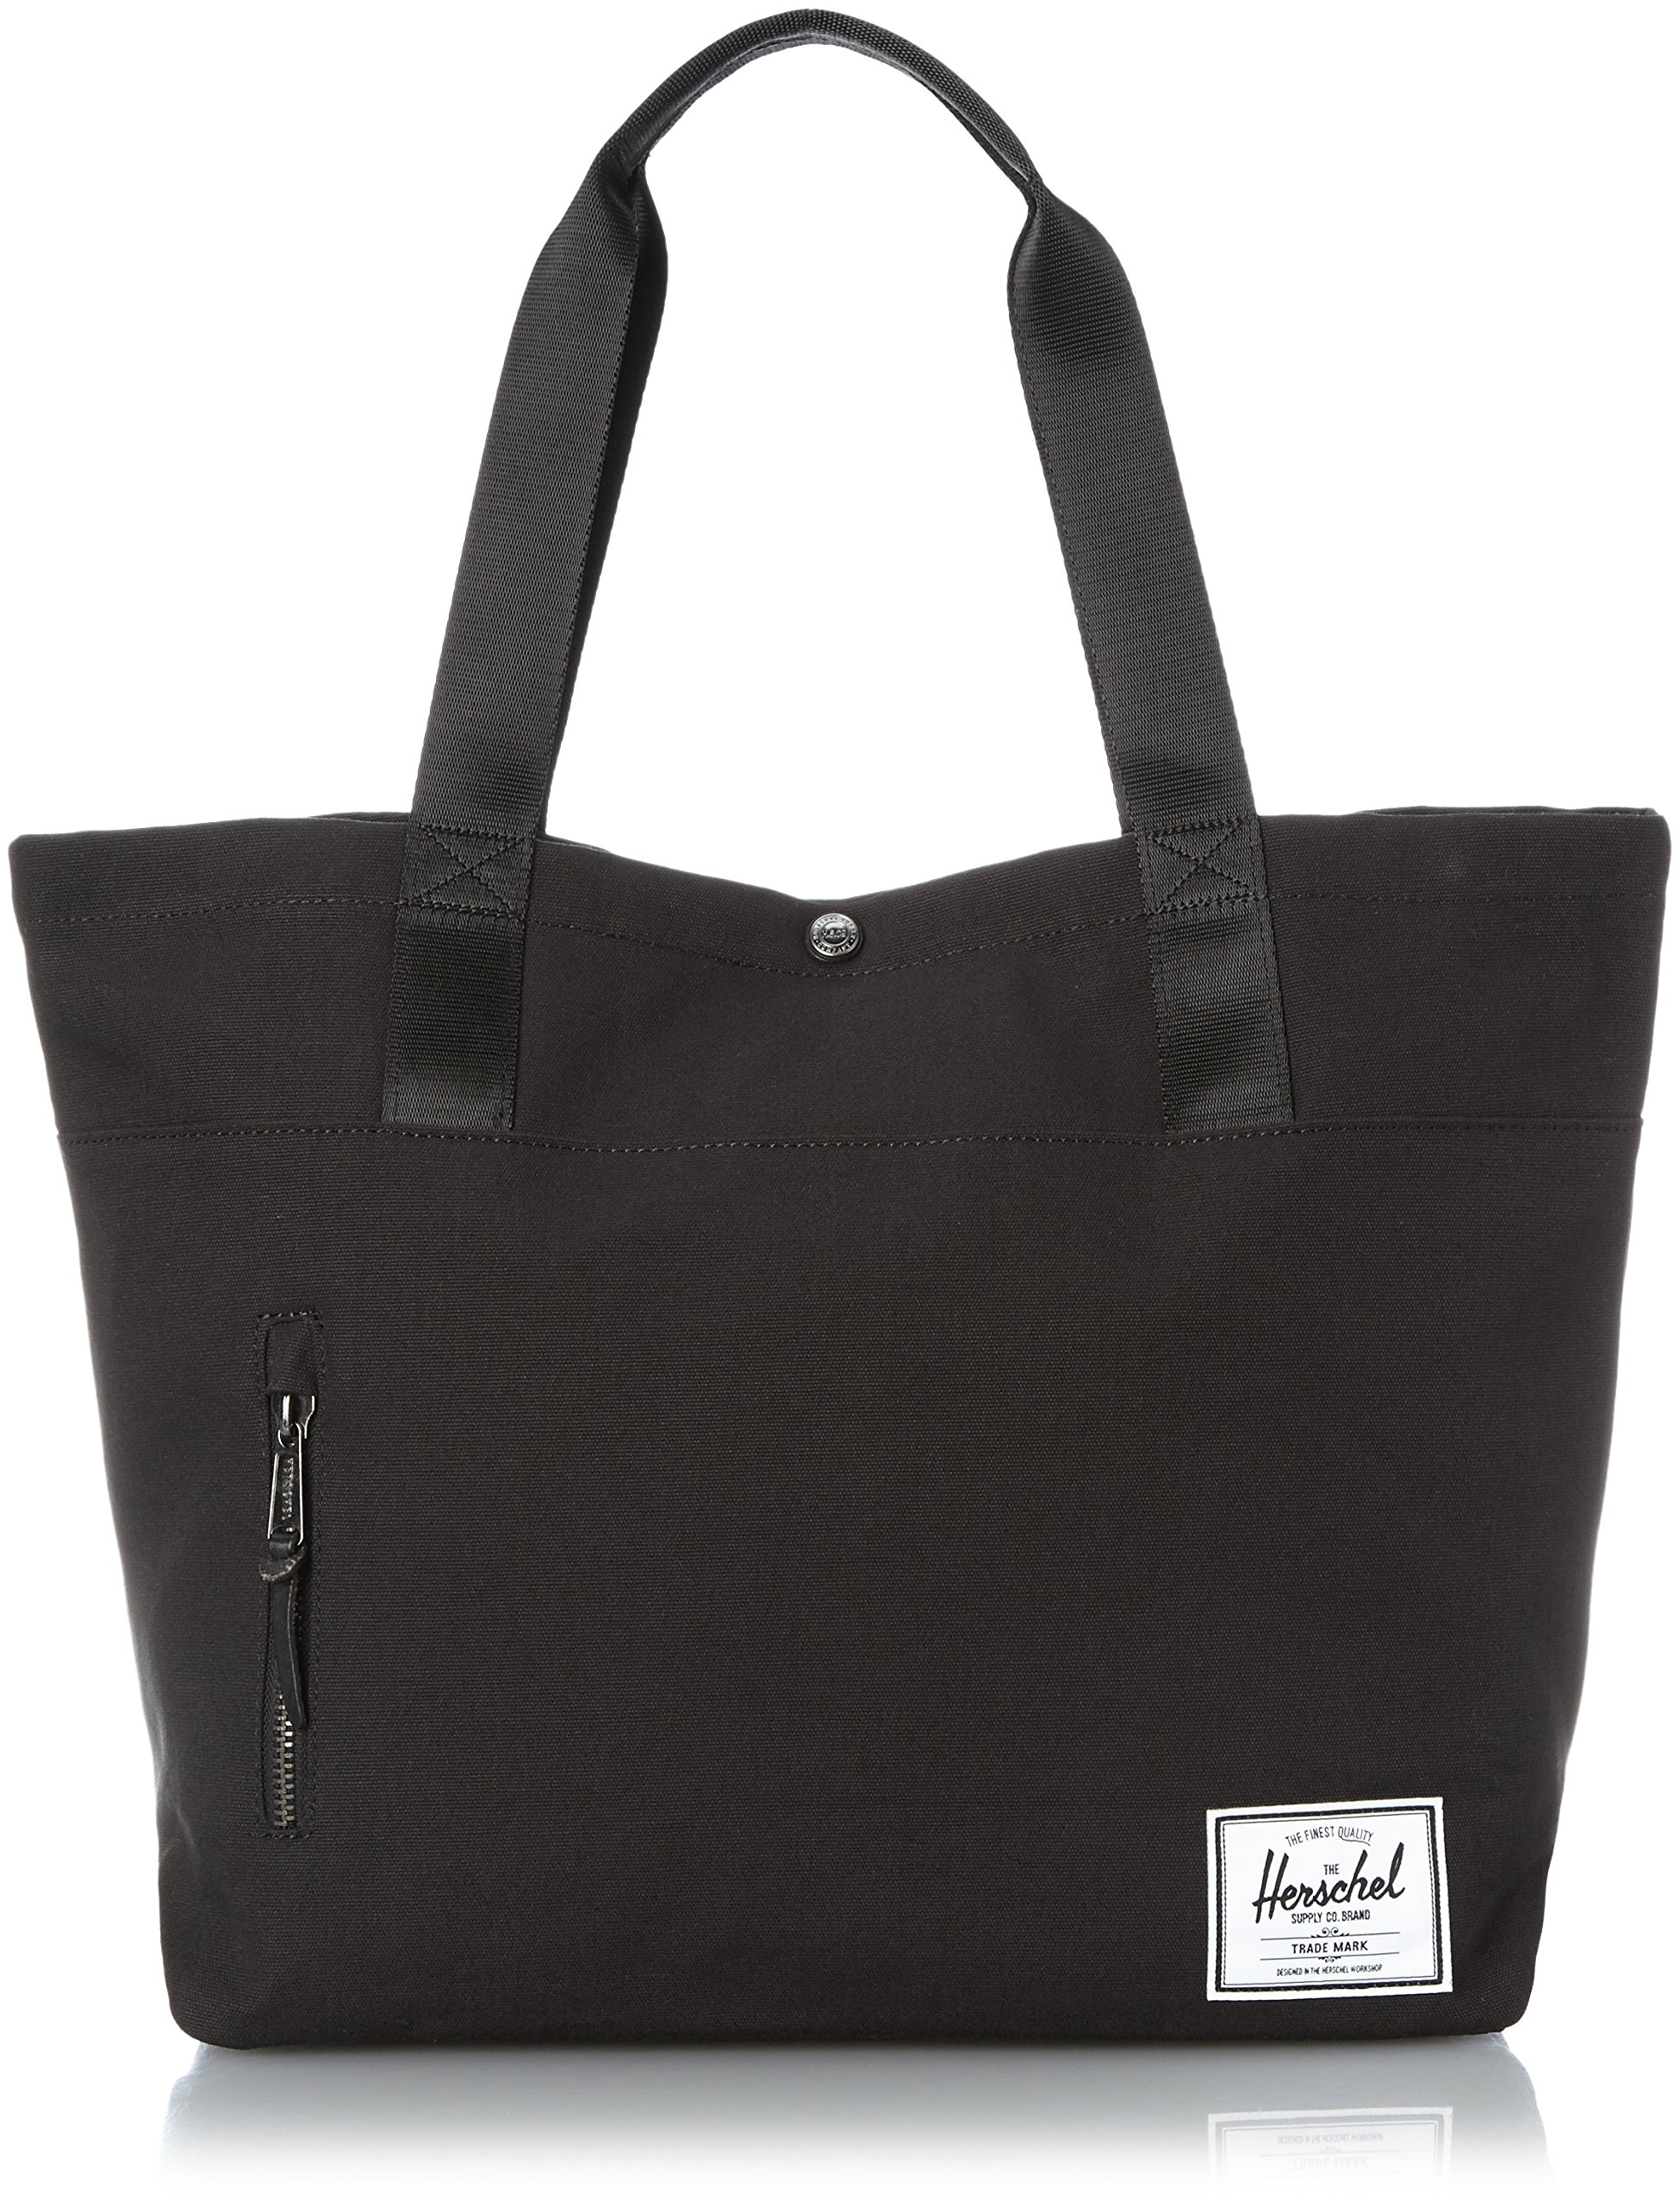 Herschel Supply Co. Alexander Select, Black, One Size